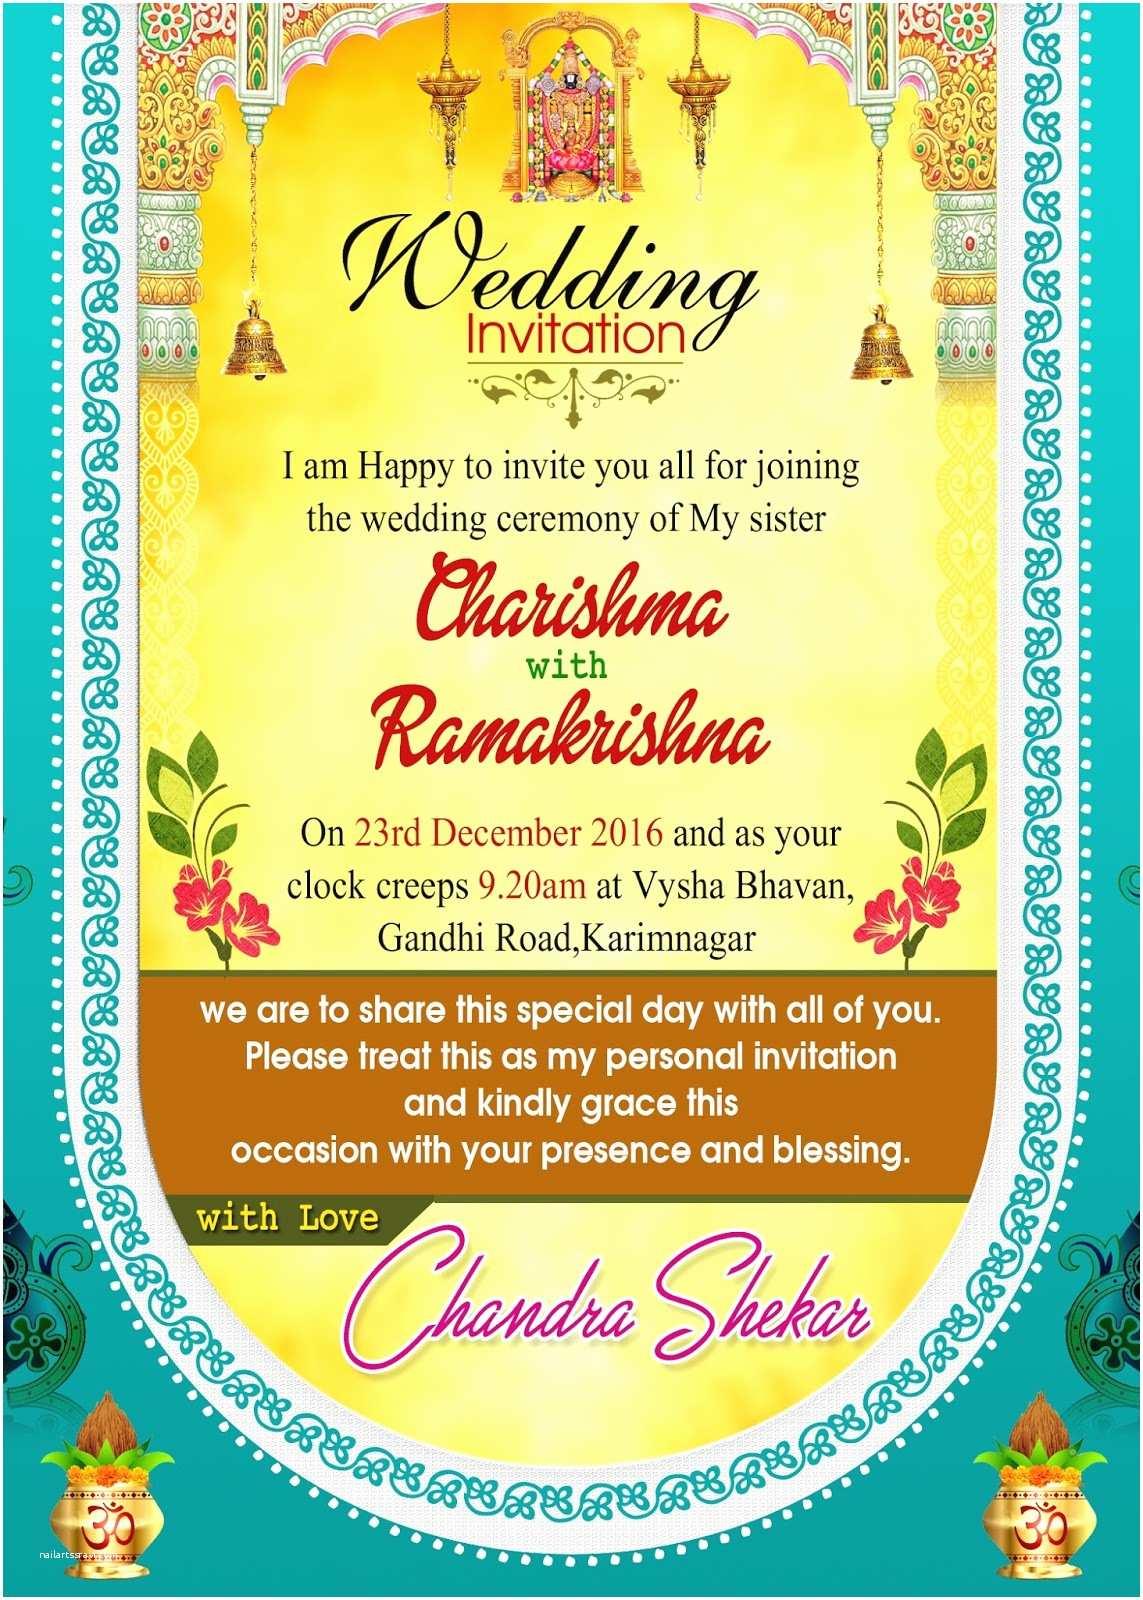 Indian Wedding Invitation Templates Indian Wedding Invitation Wordings Psd Template Free for